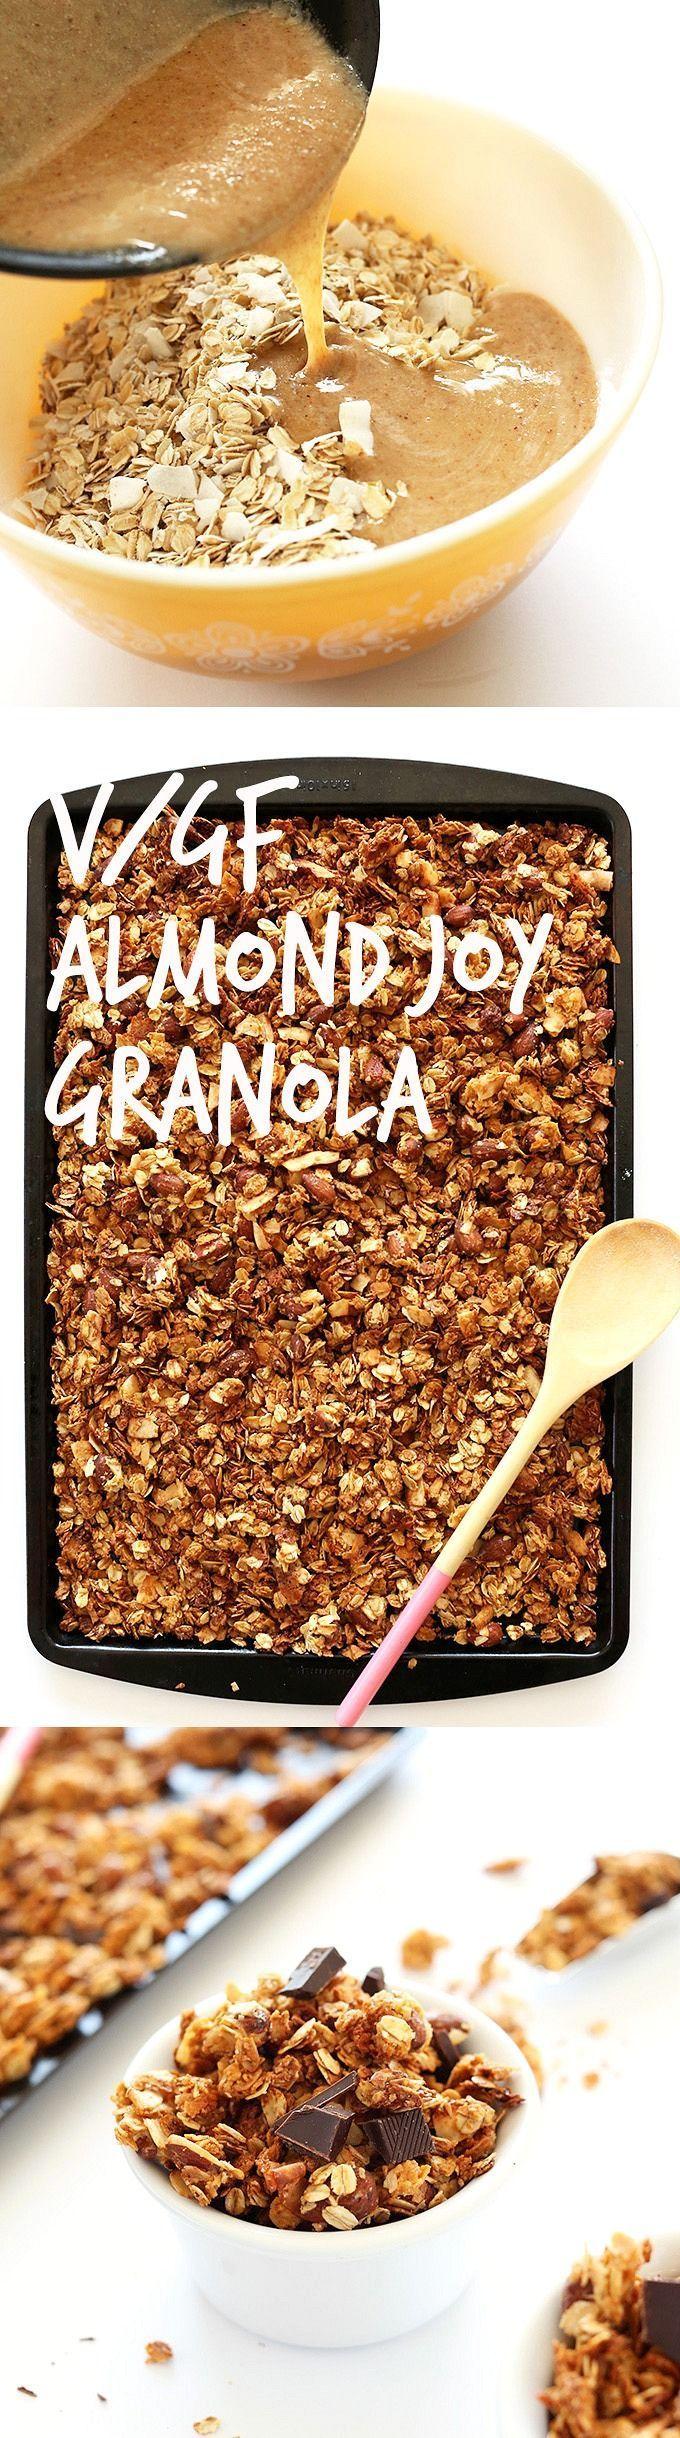 SALTY-SWEET and HEALTHY Almond Joy Granola! 9 ingredients, 30 minutes #vegan #glutenfree